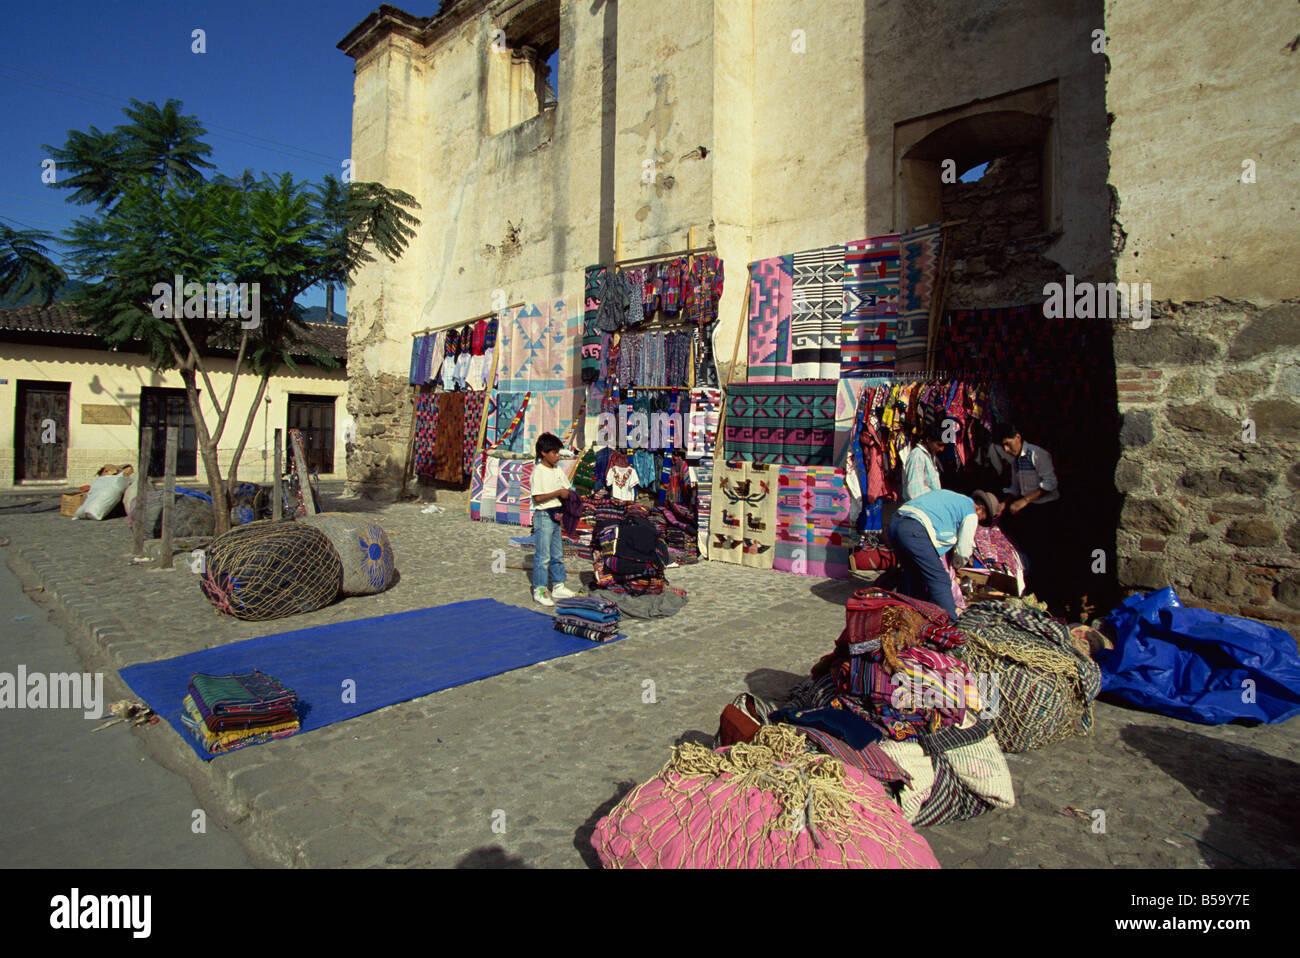 Local Indian souvenir stalls, Antigua, Guatemala, Central America - Stock Image